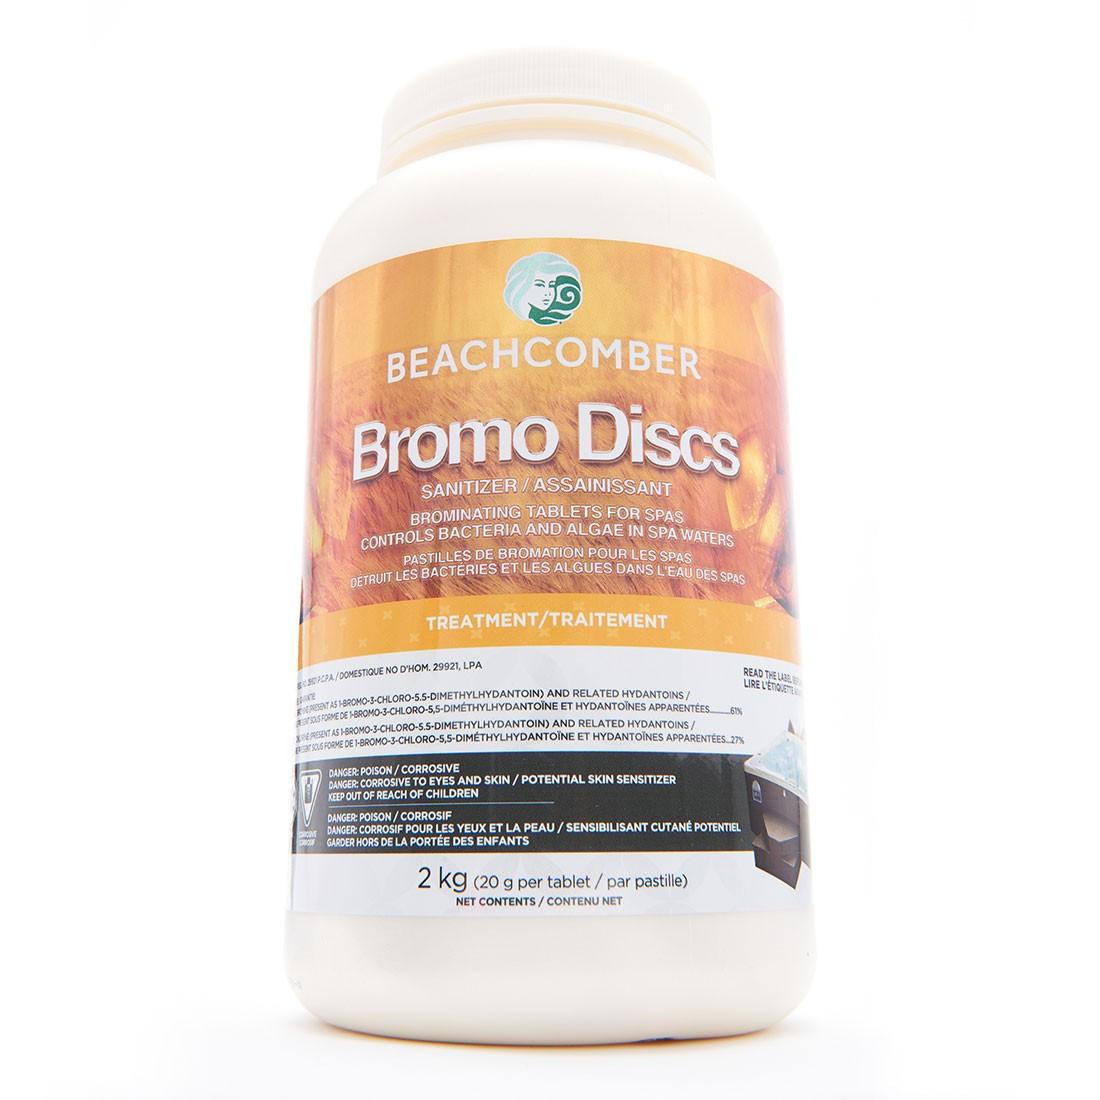 Bromo Discs